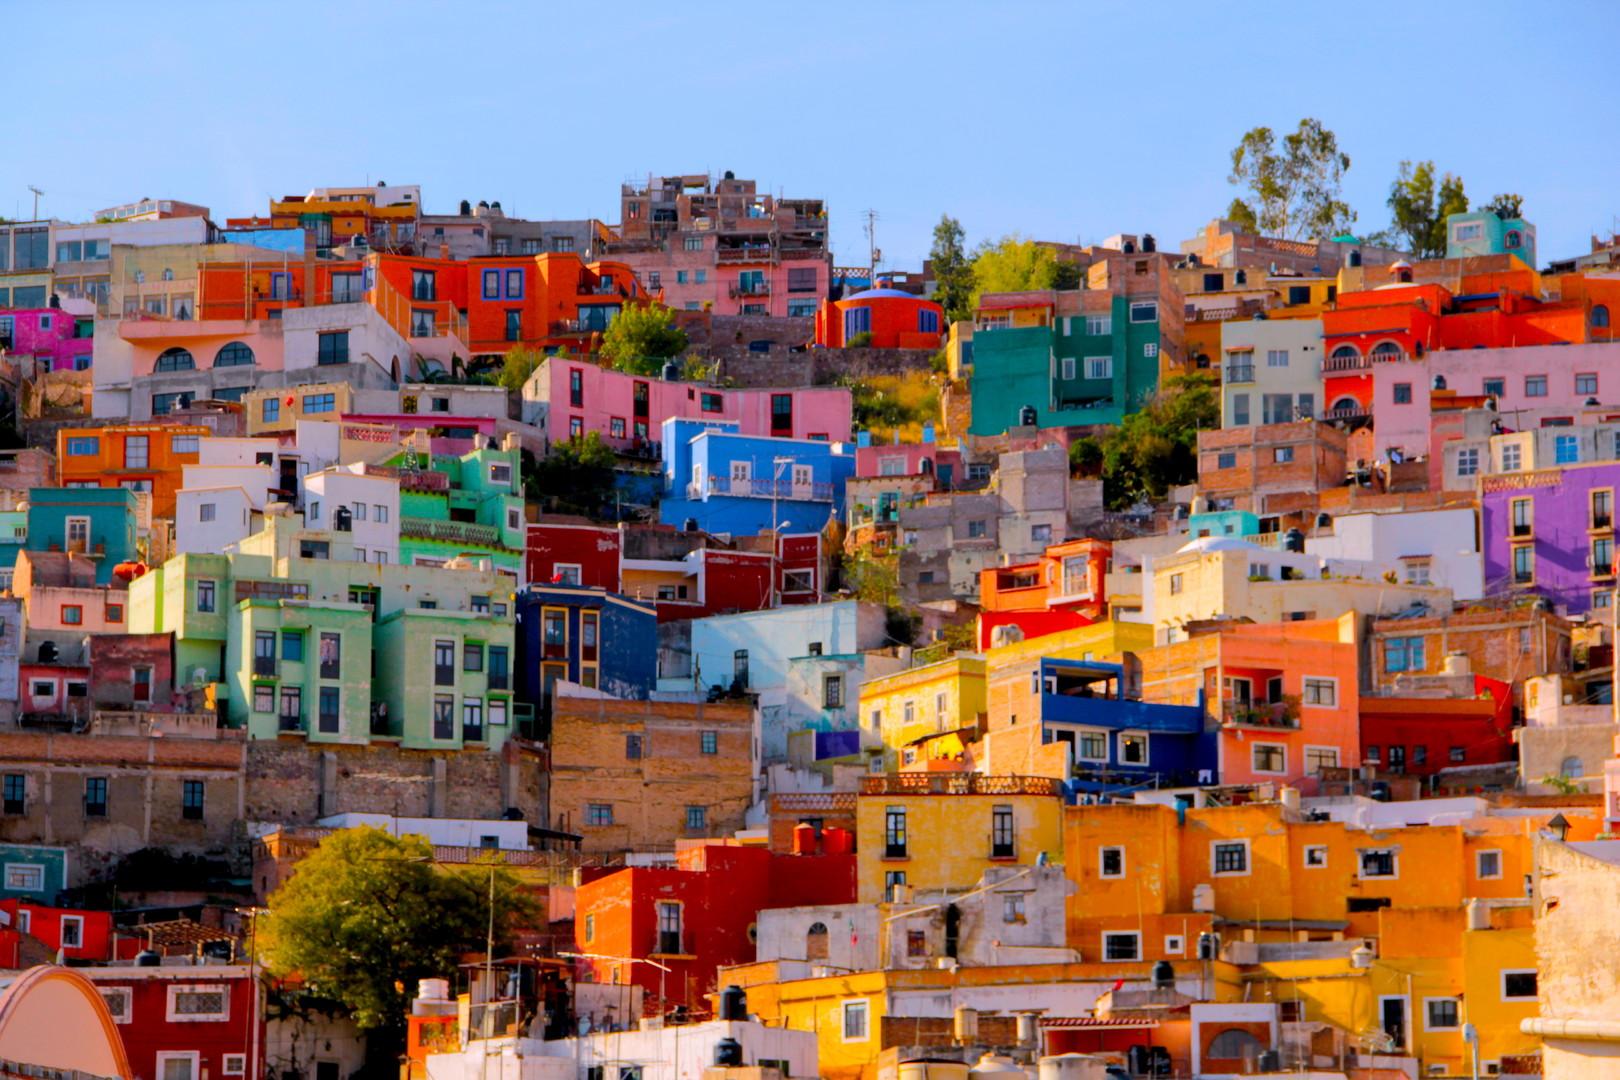 Koloniální města & Día de los Muertos